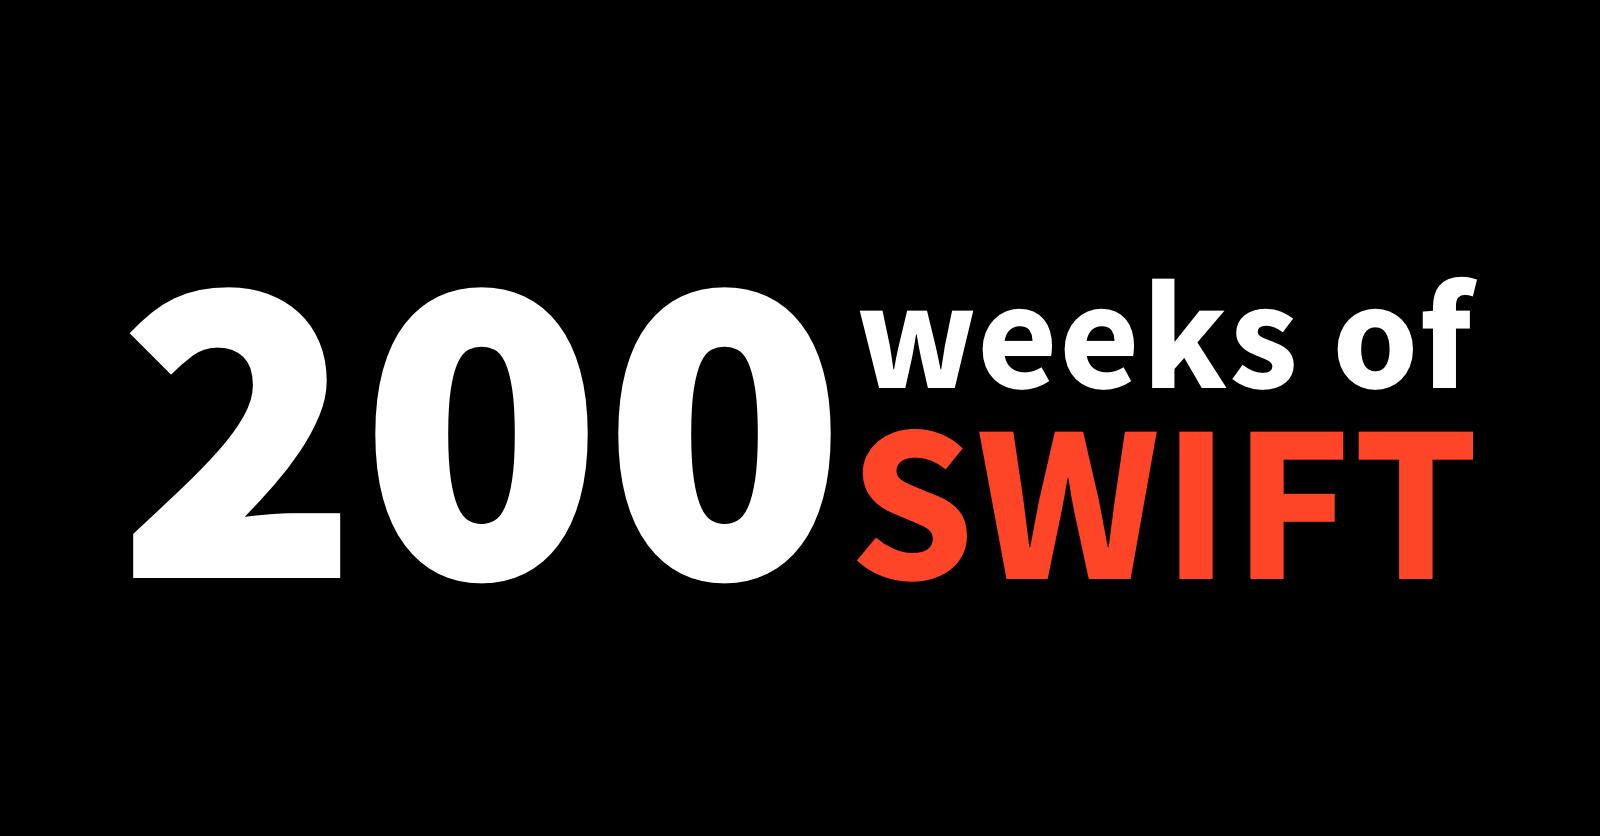 200 weeks of Swift